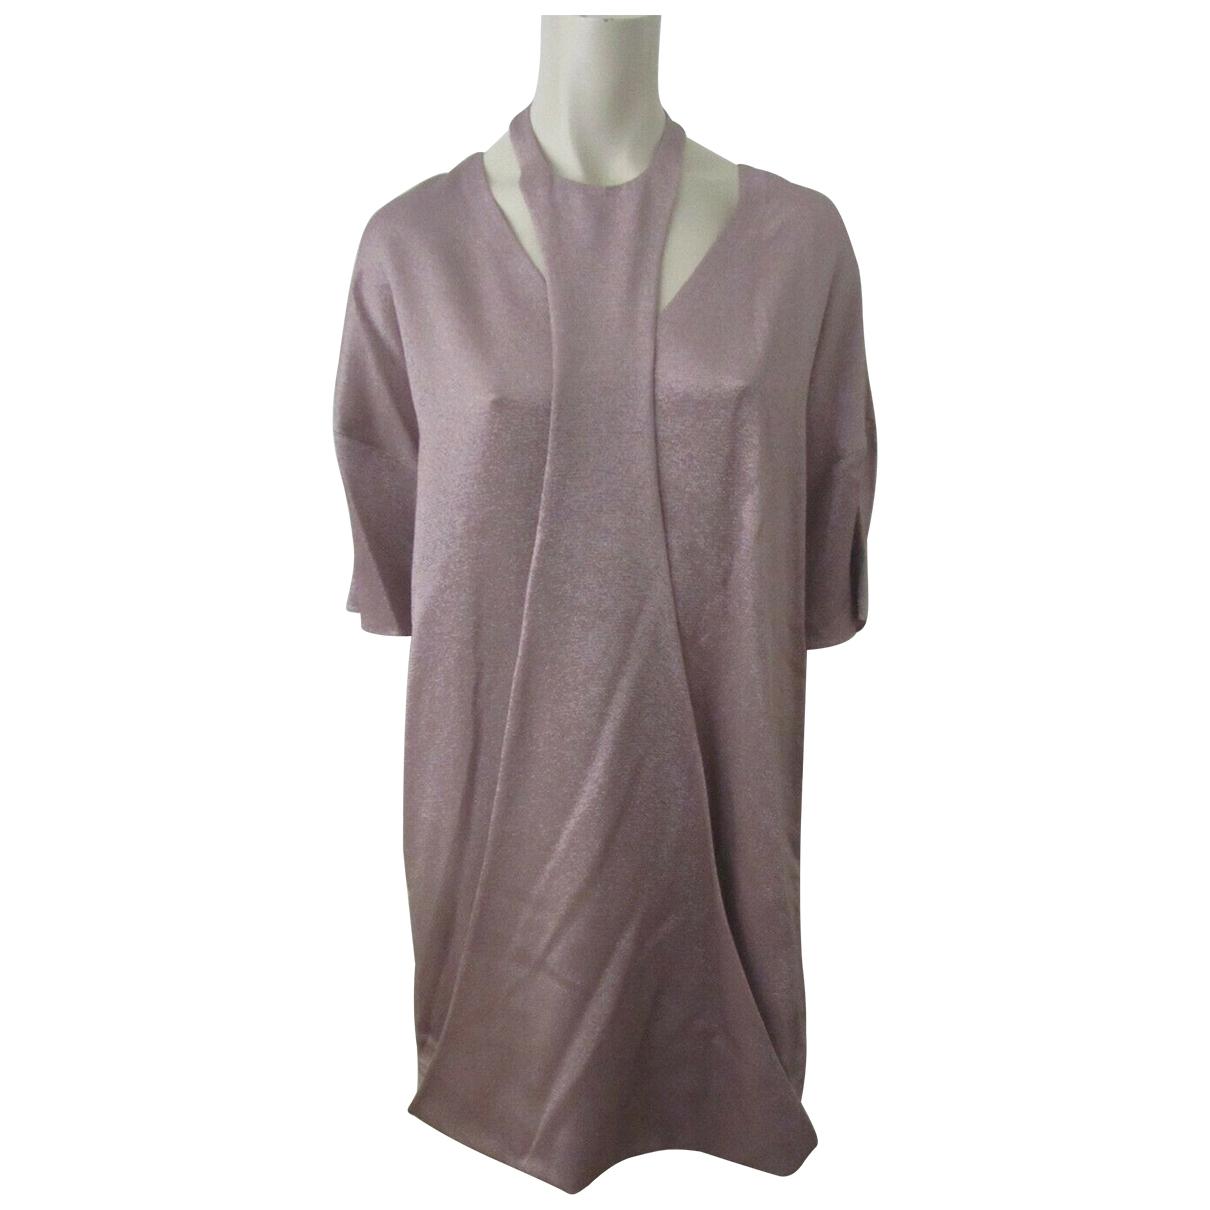 Valentino Garavani \N Pink dress for Women 40 IT